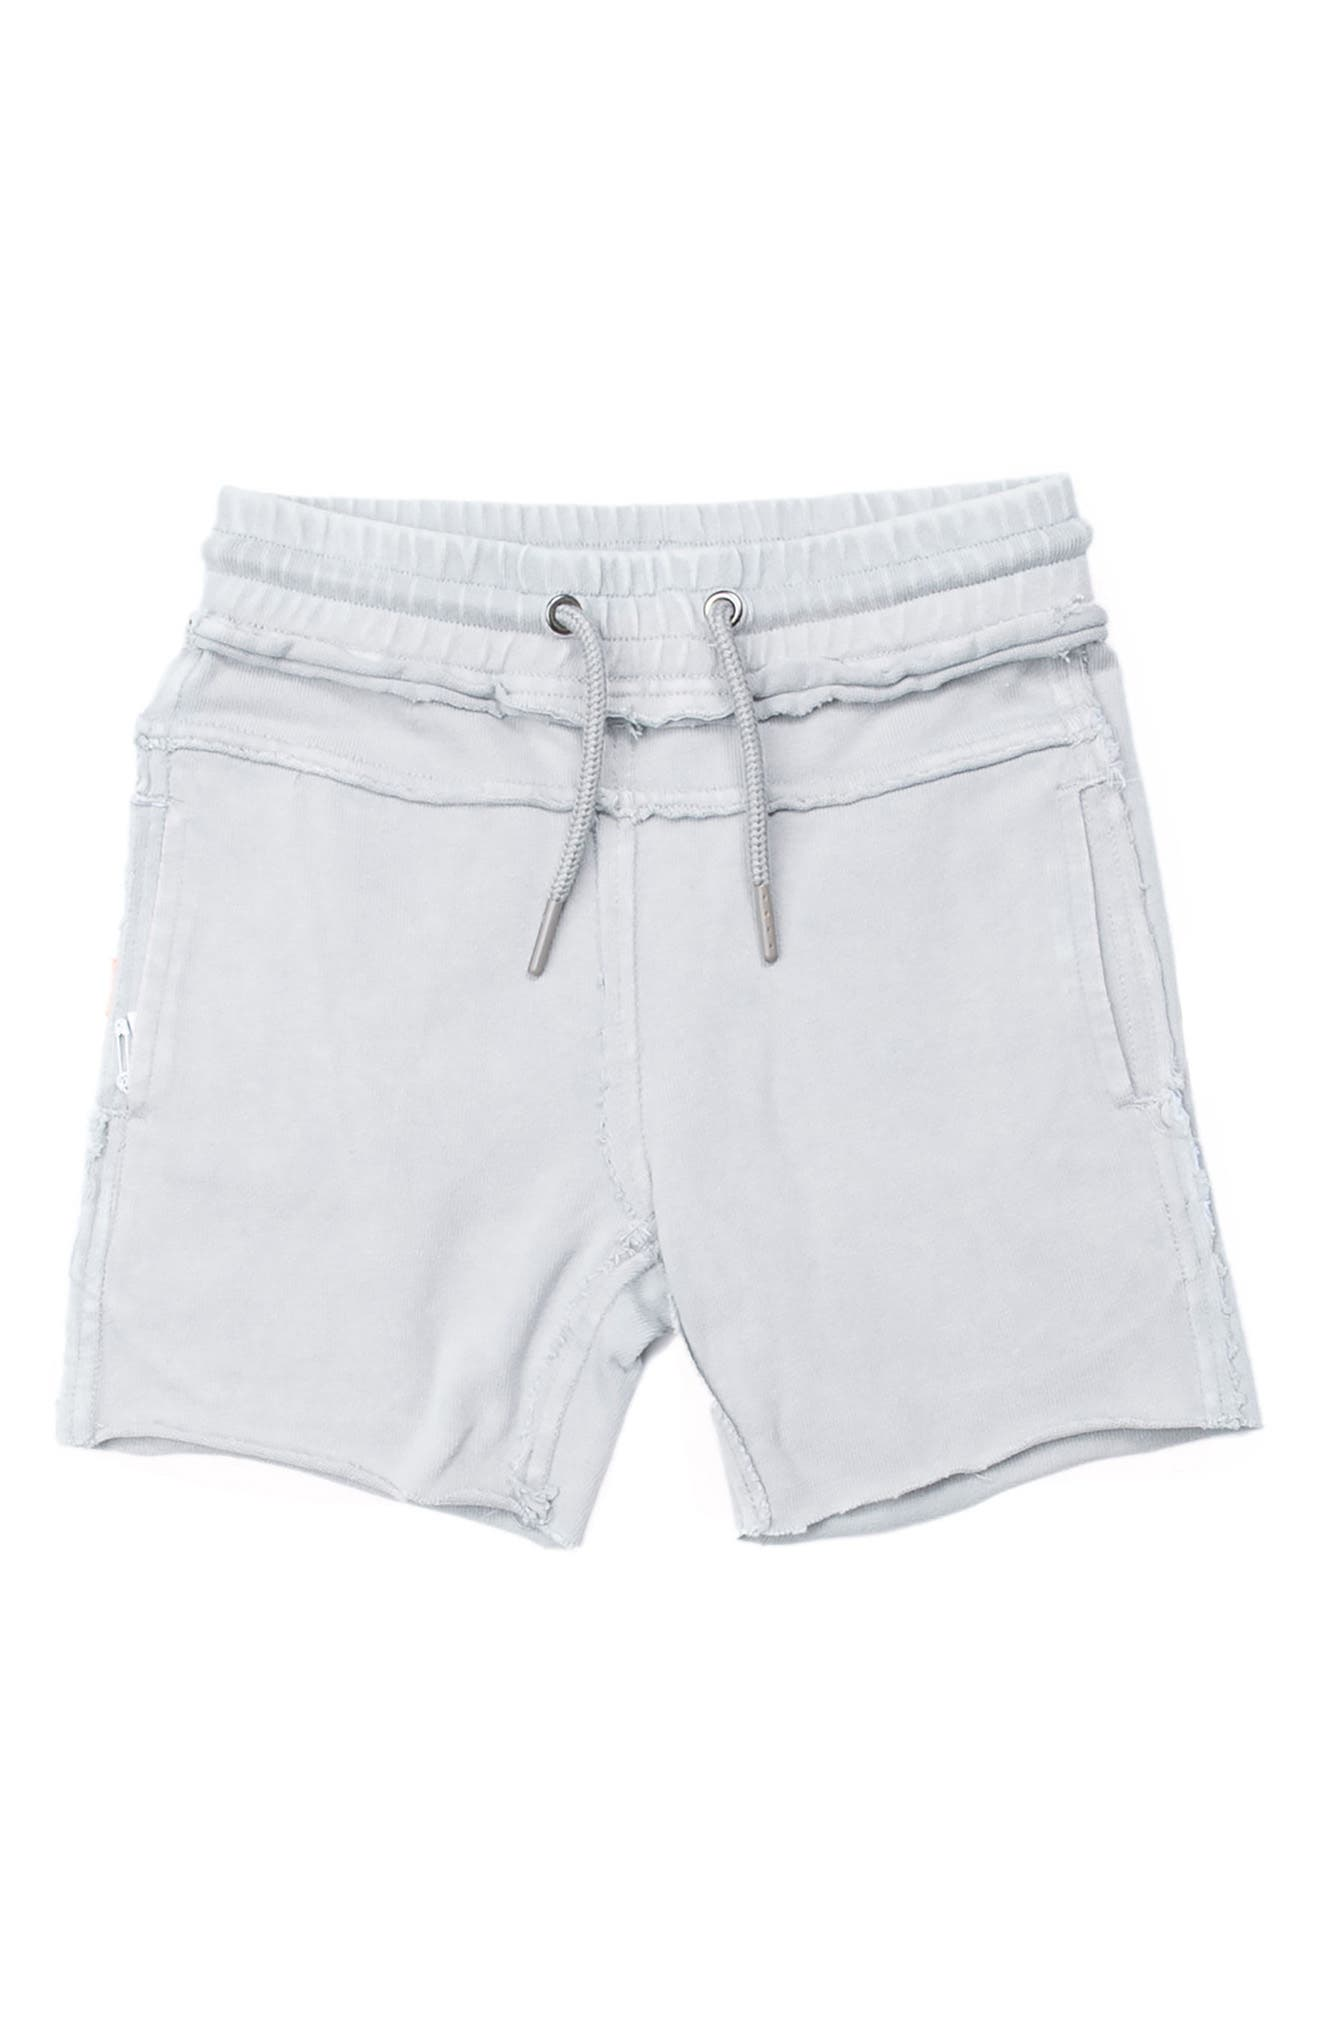 Kirk Distressed Shorts,                         Main,                         color, 020